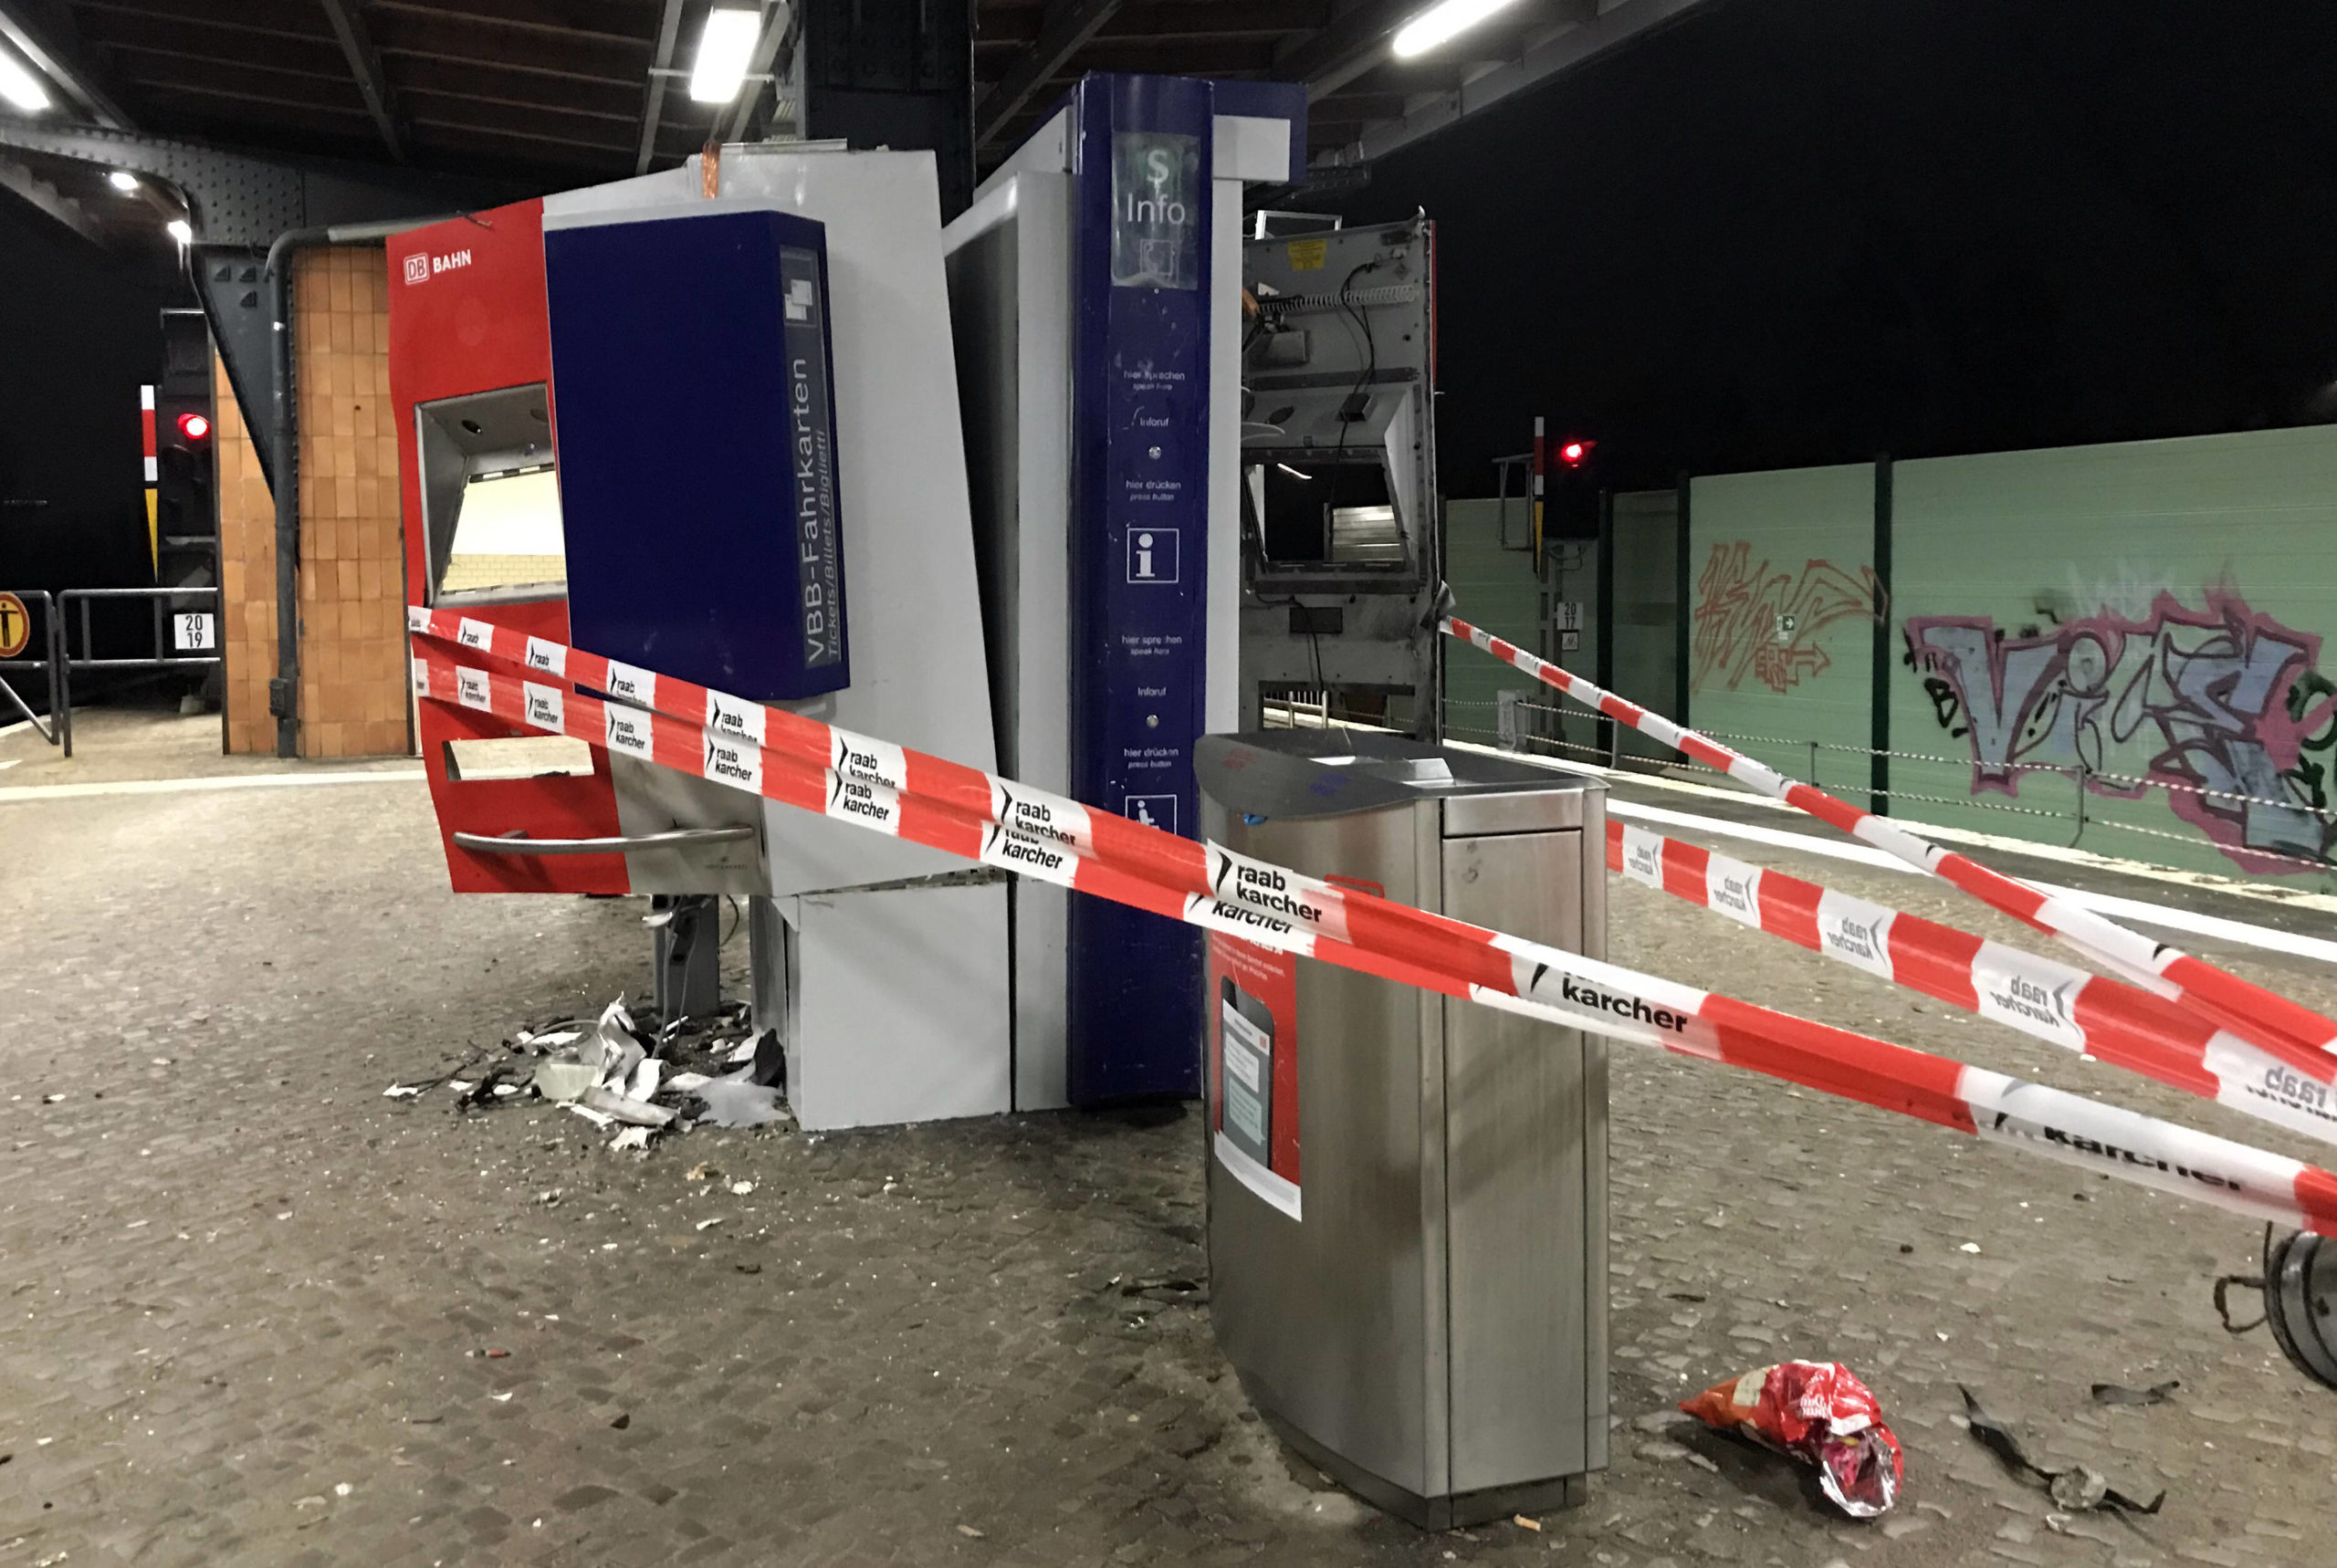 Kaputt in Berlin: Gesprengte Fahrkartenautomaten auf dem S-Bahnhof Attilastraße. Foto: Imago/Frank Sorge